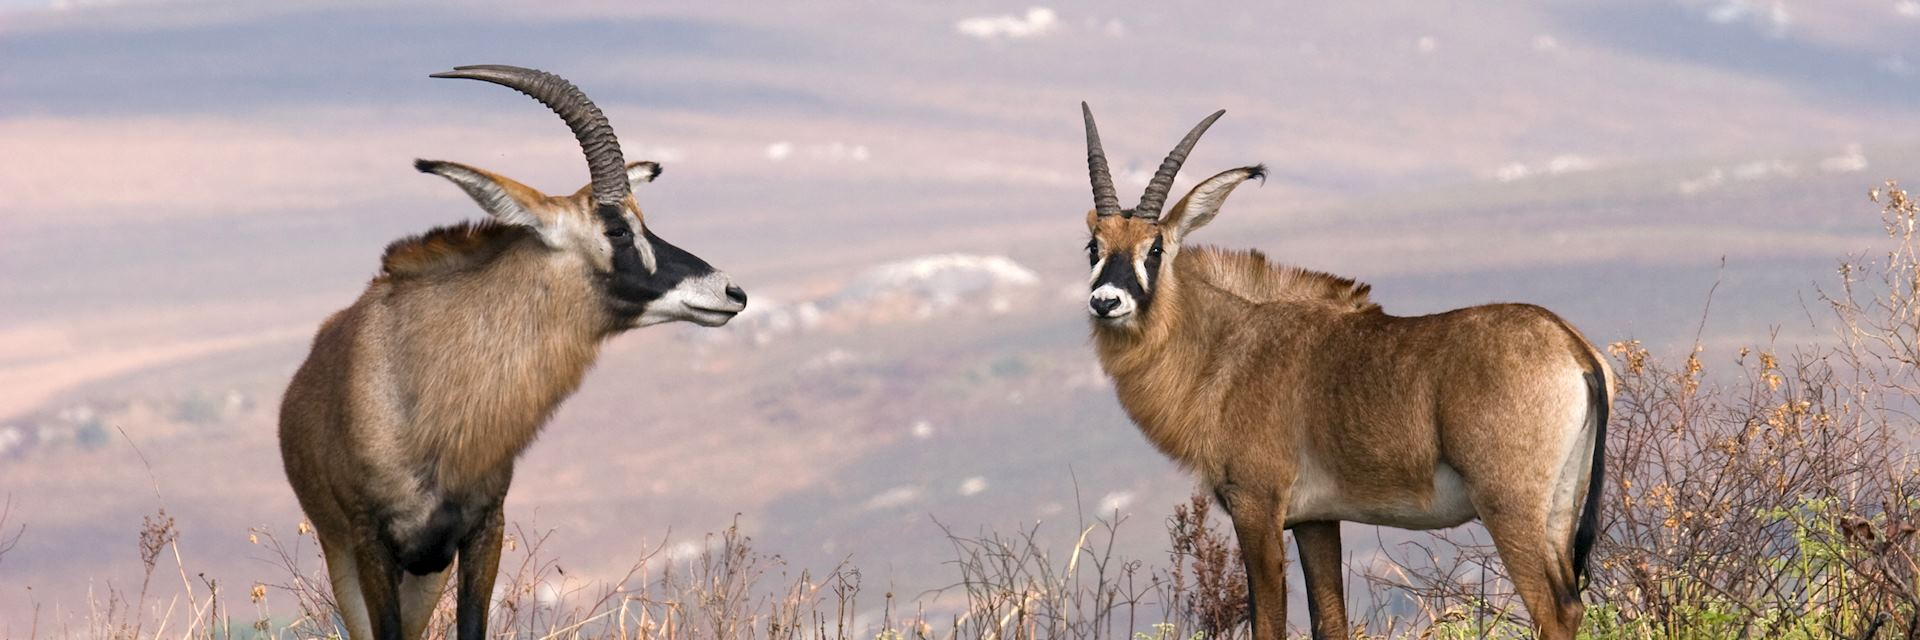 Roan antelope, Nyika Plateau in Malawi